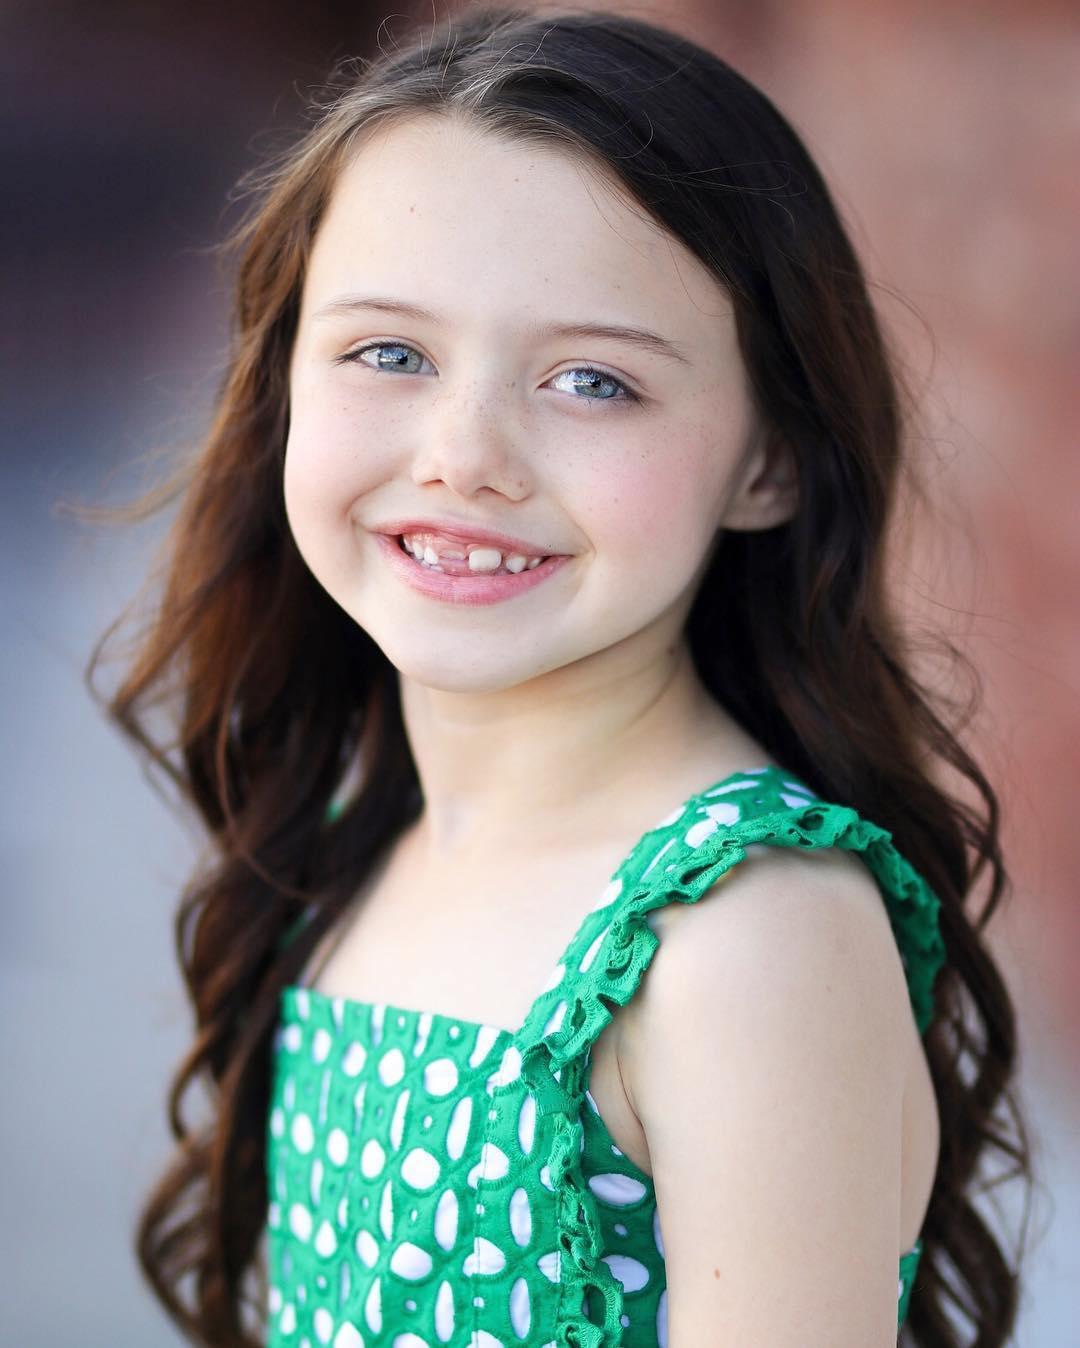 Violet McGraw American Actress